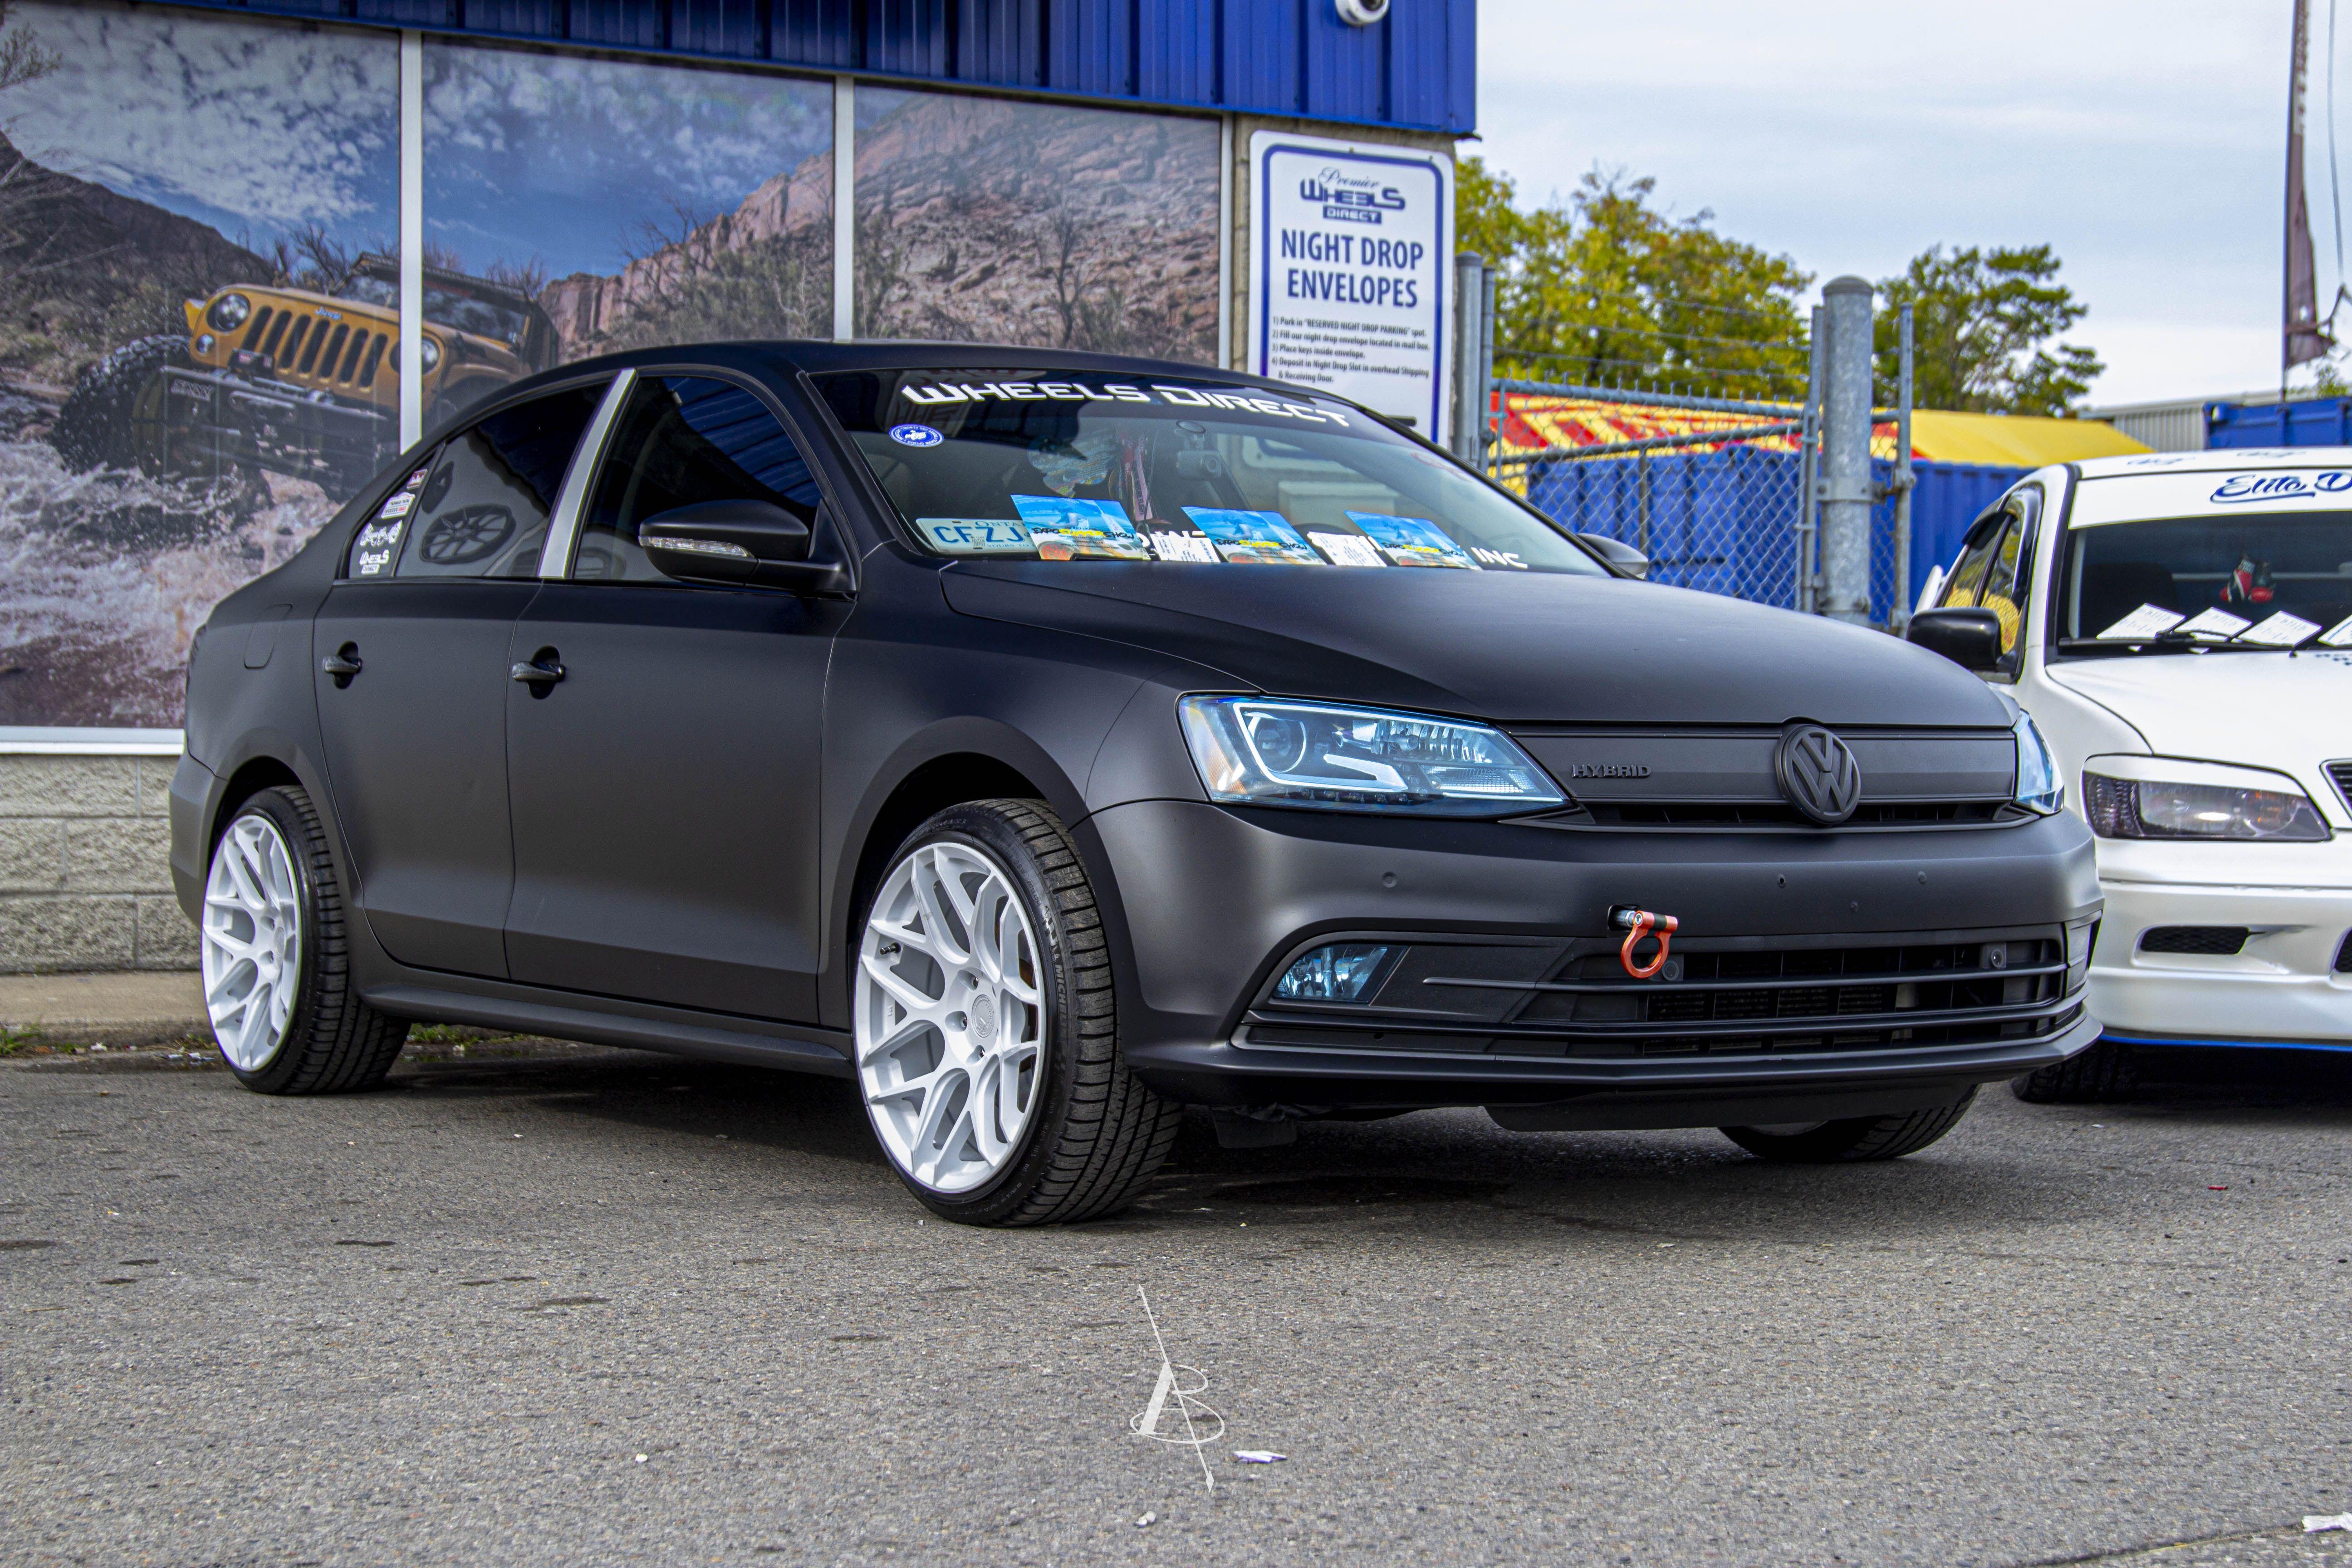 Volkswagen Jetta Hybrid Huge Thanks To Exposummershowca For Putting This Amazing Show Together Event Exposummershowc In 2020 Vw Jetta Volkswagen Jetta Jetta Gli